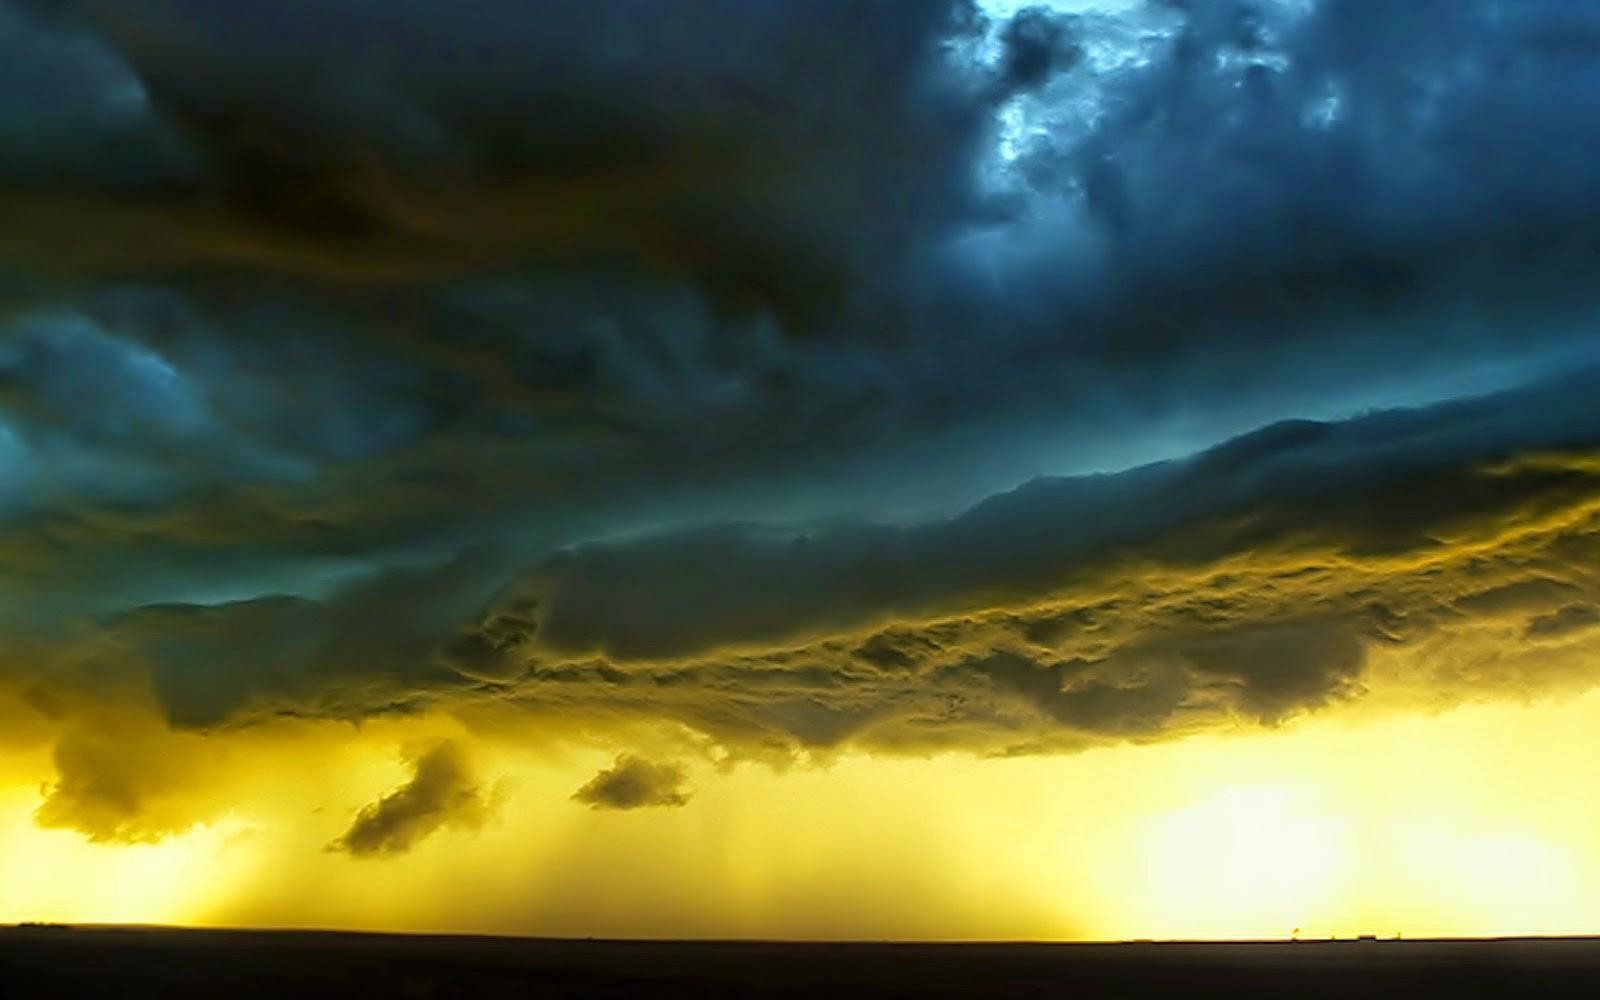 storm-clouds-wallpaper-thunderstorms-nature_00431186.jpg